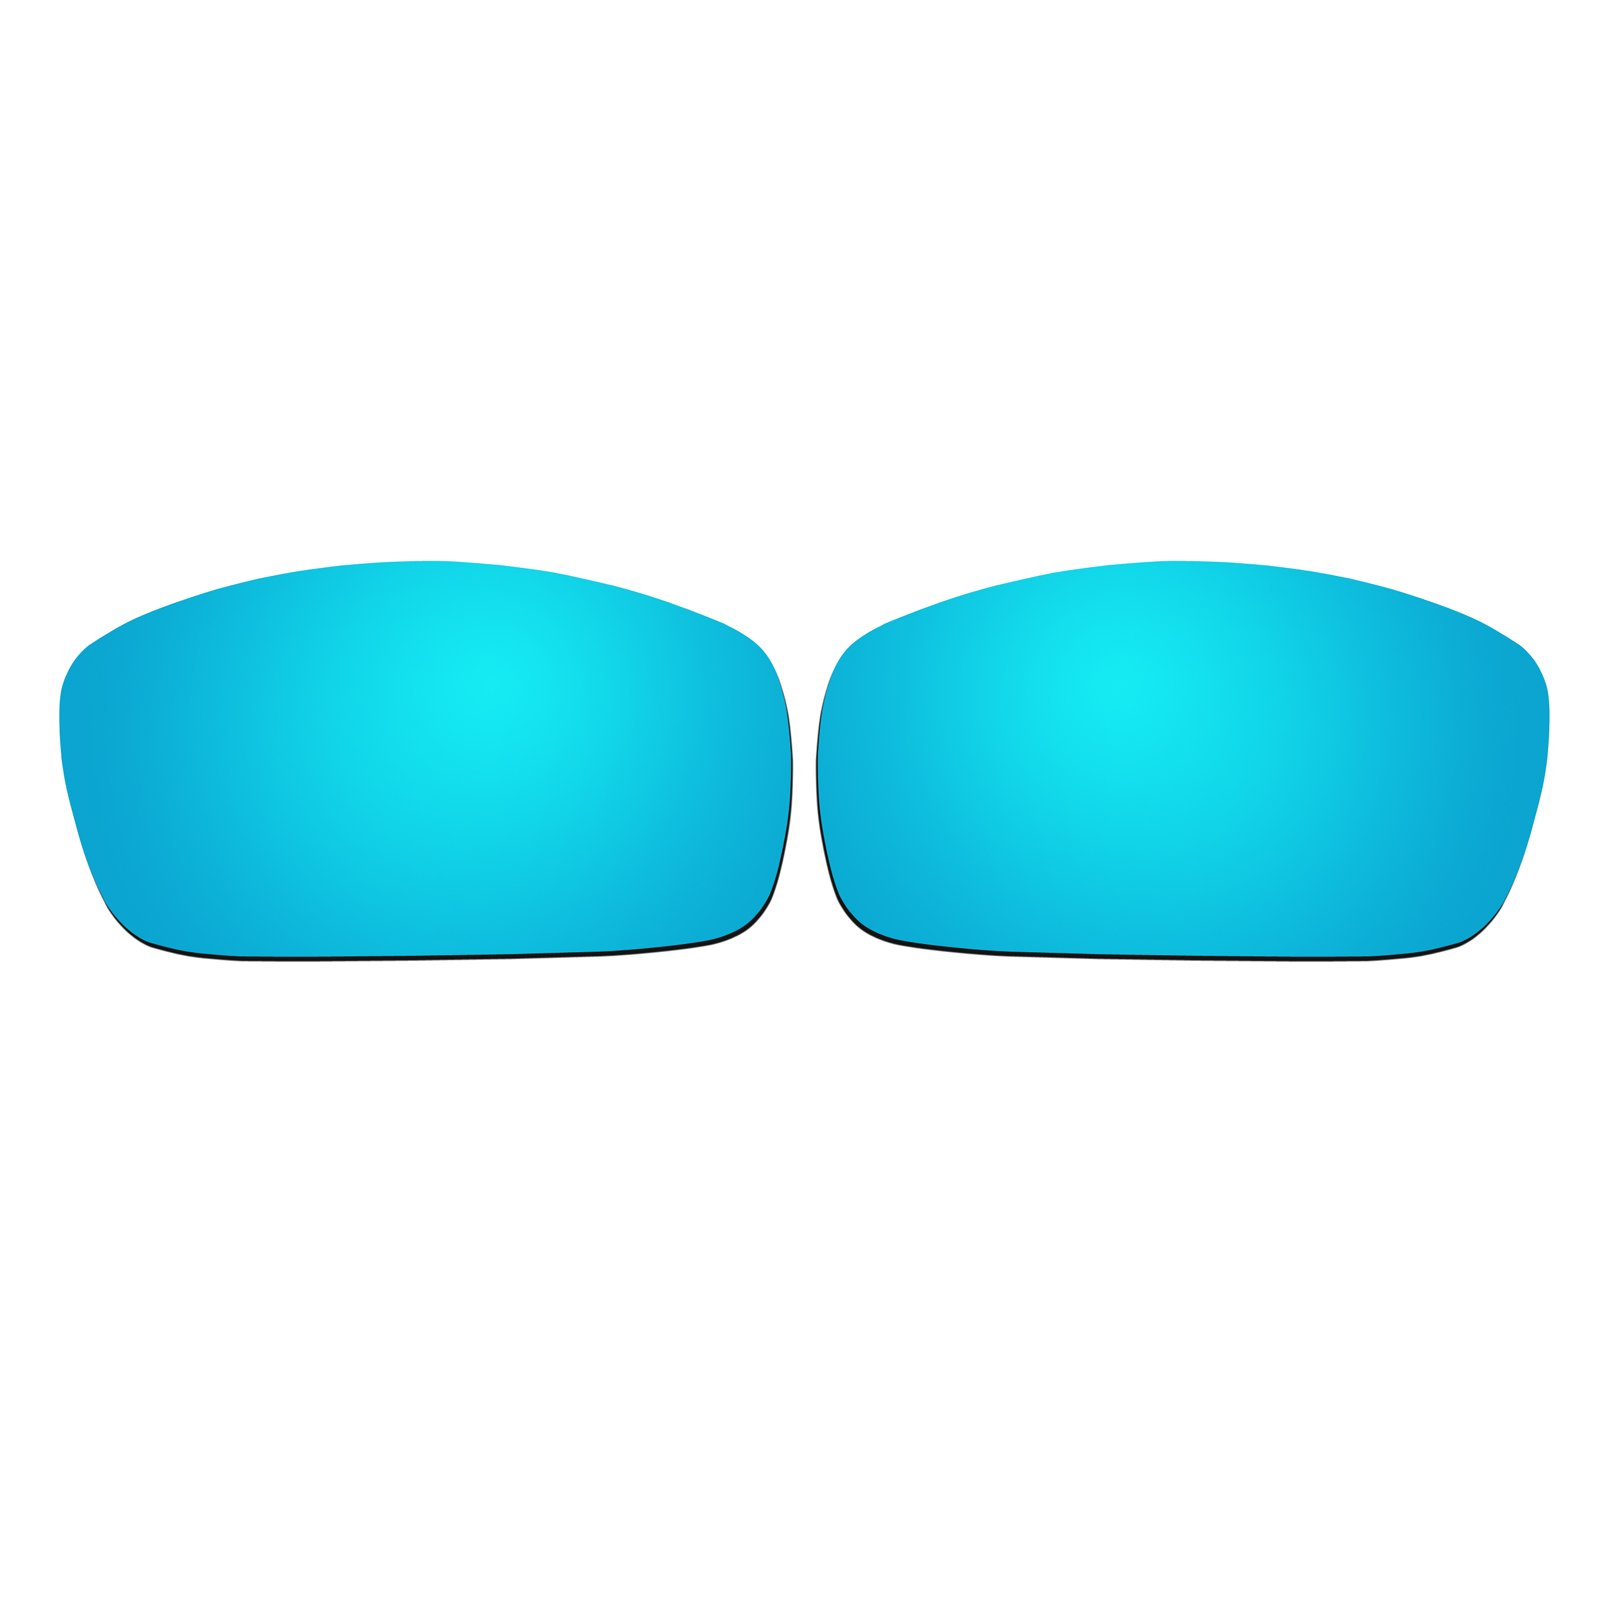 Polarized Replacement Sunglasses Lenses for Spy Optic Logan - Ice Blue Mirror